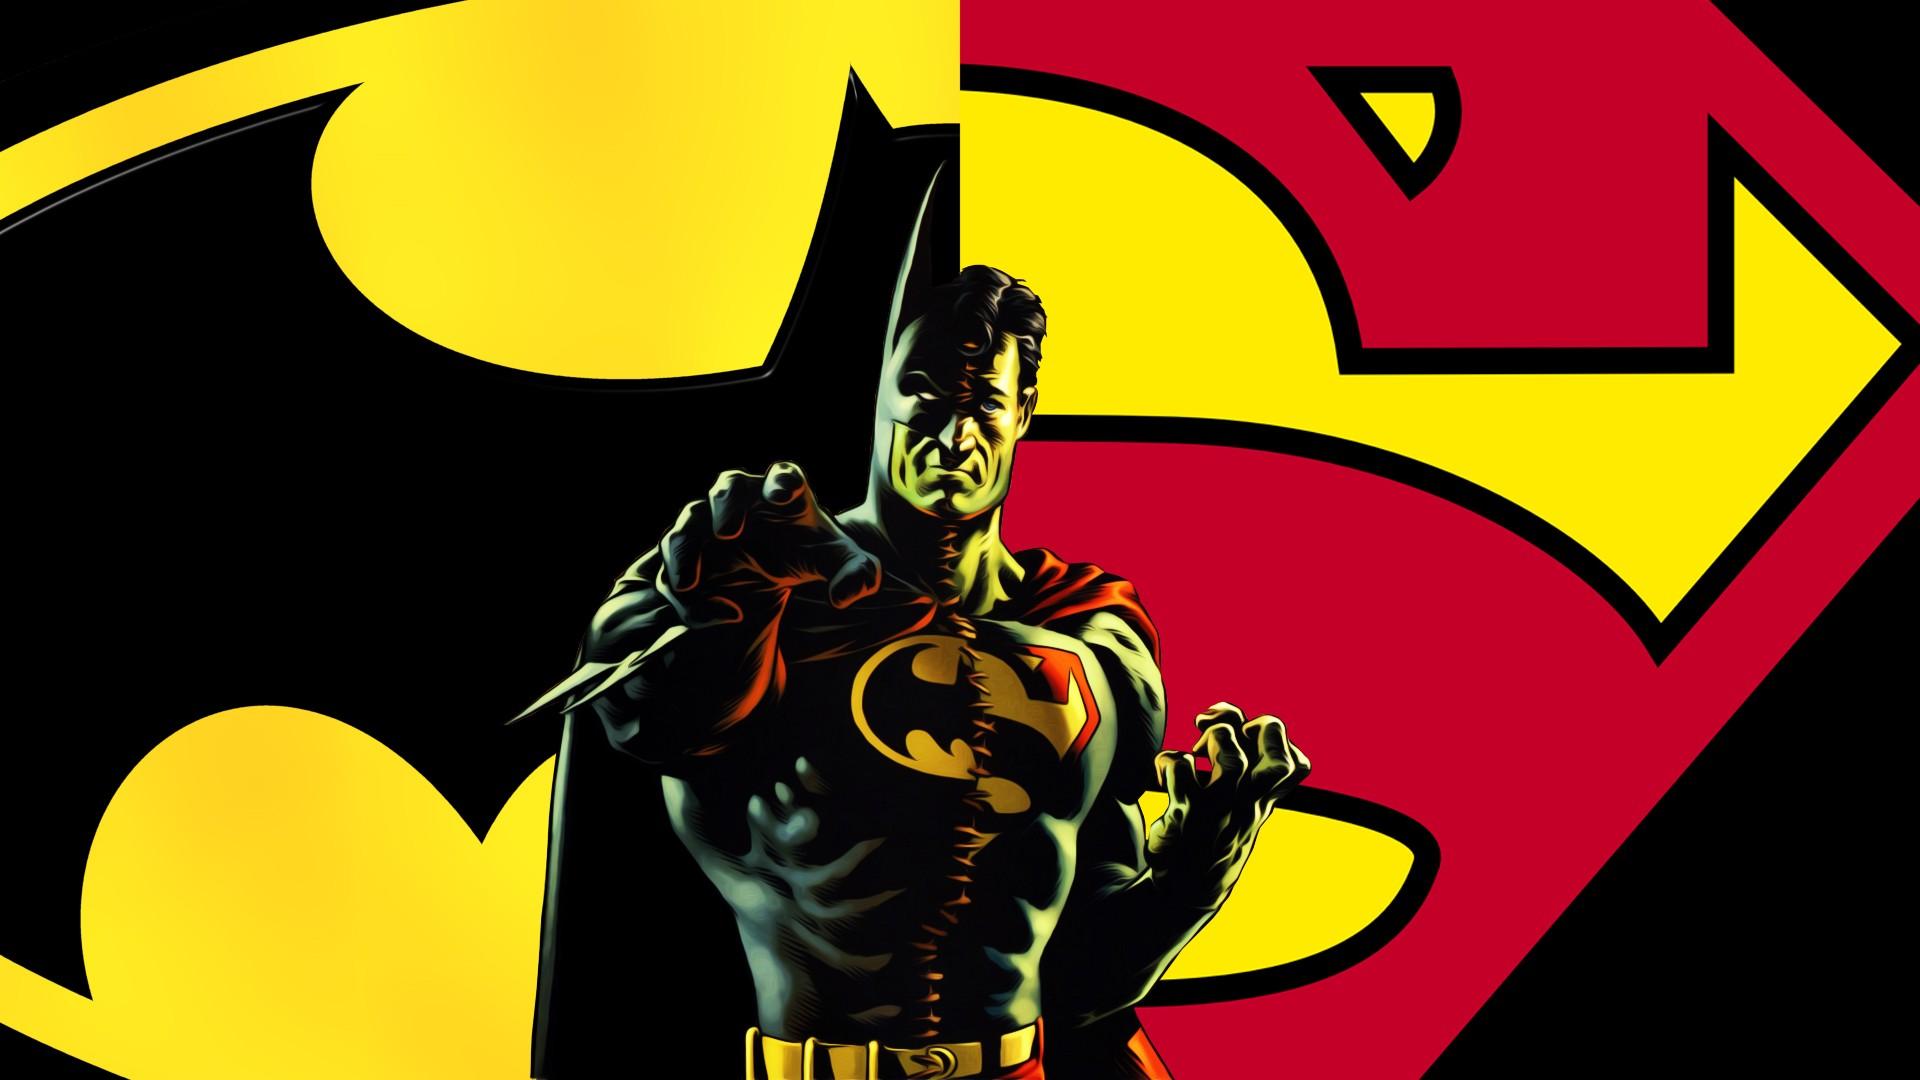 batman superman3 1920x1080